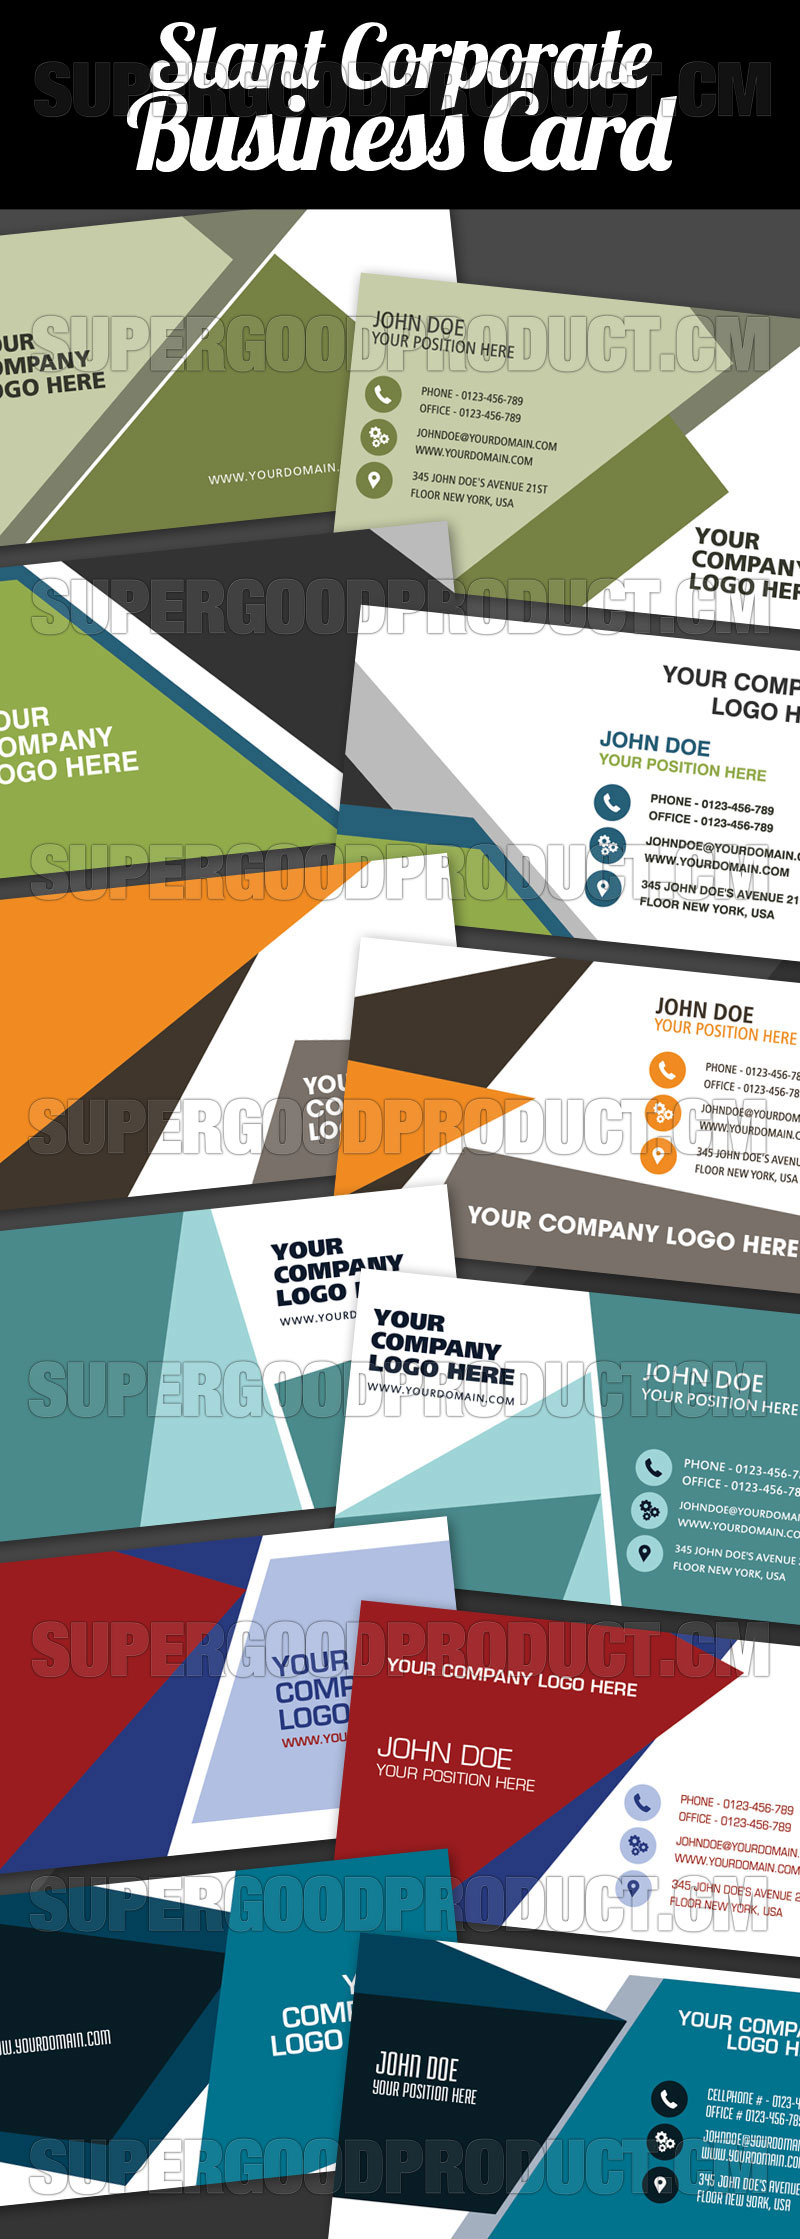 Slant-Corporate-Business-Card